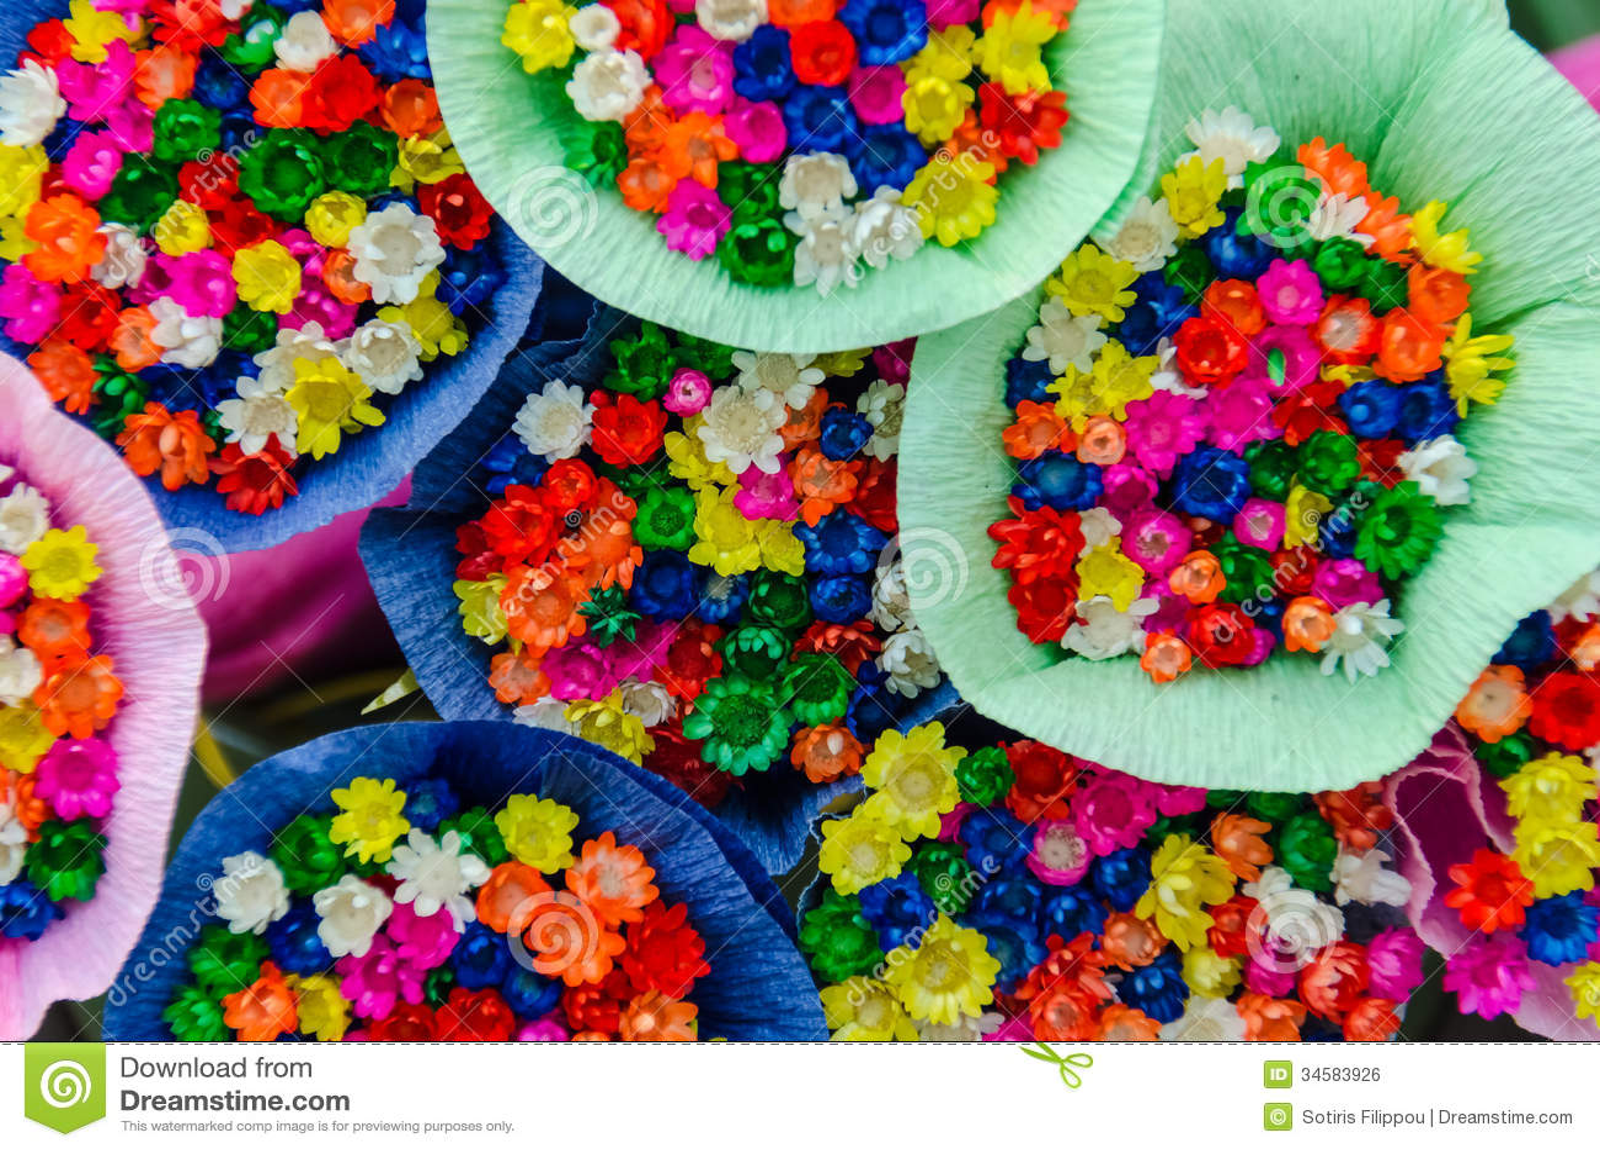 Fresh little flowers stock photo image of arrangement 34583926 fresh little flowers izmirmasajfo Gallery